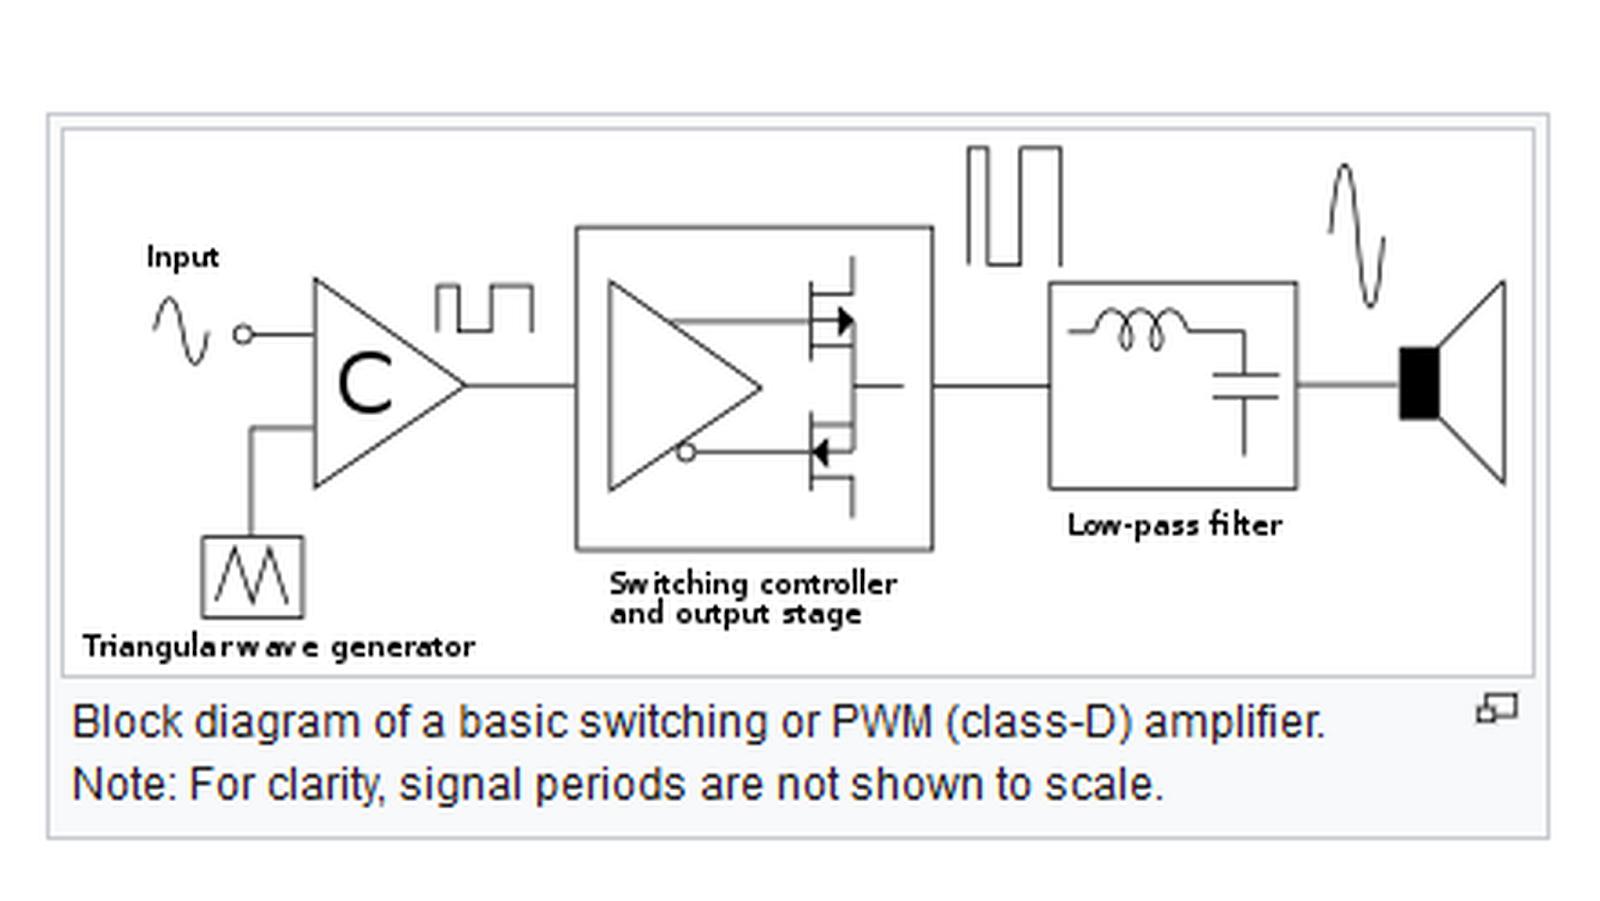 Bridge Speakers Diagram Schematics Wiring Diagrams Amp To Bengkel Pak Agus Speaker Construction 4 Channel 2 1 Sub